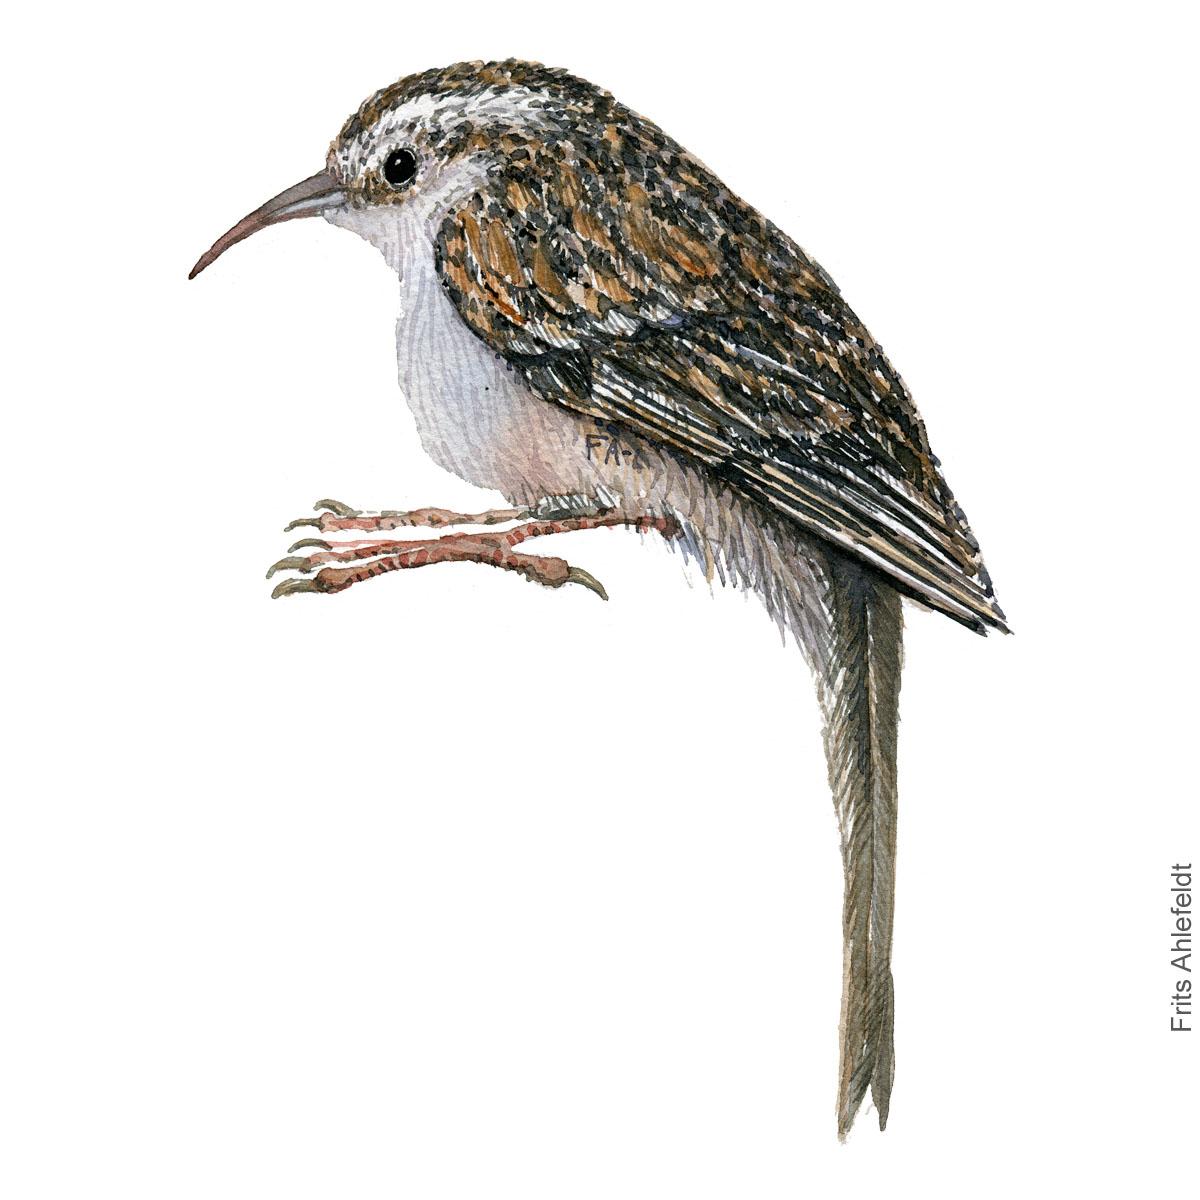 Short toed treecreeper. Korttaaet traeloeber. akvarel. Watercolor painting by Frits Ahlefeldt